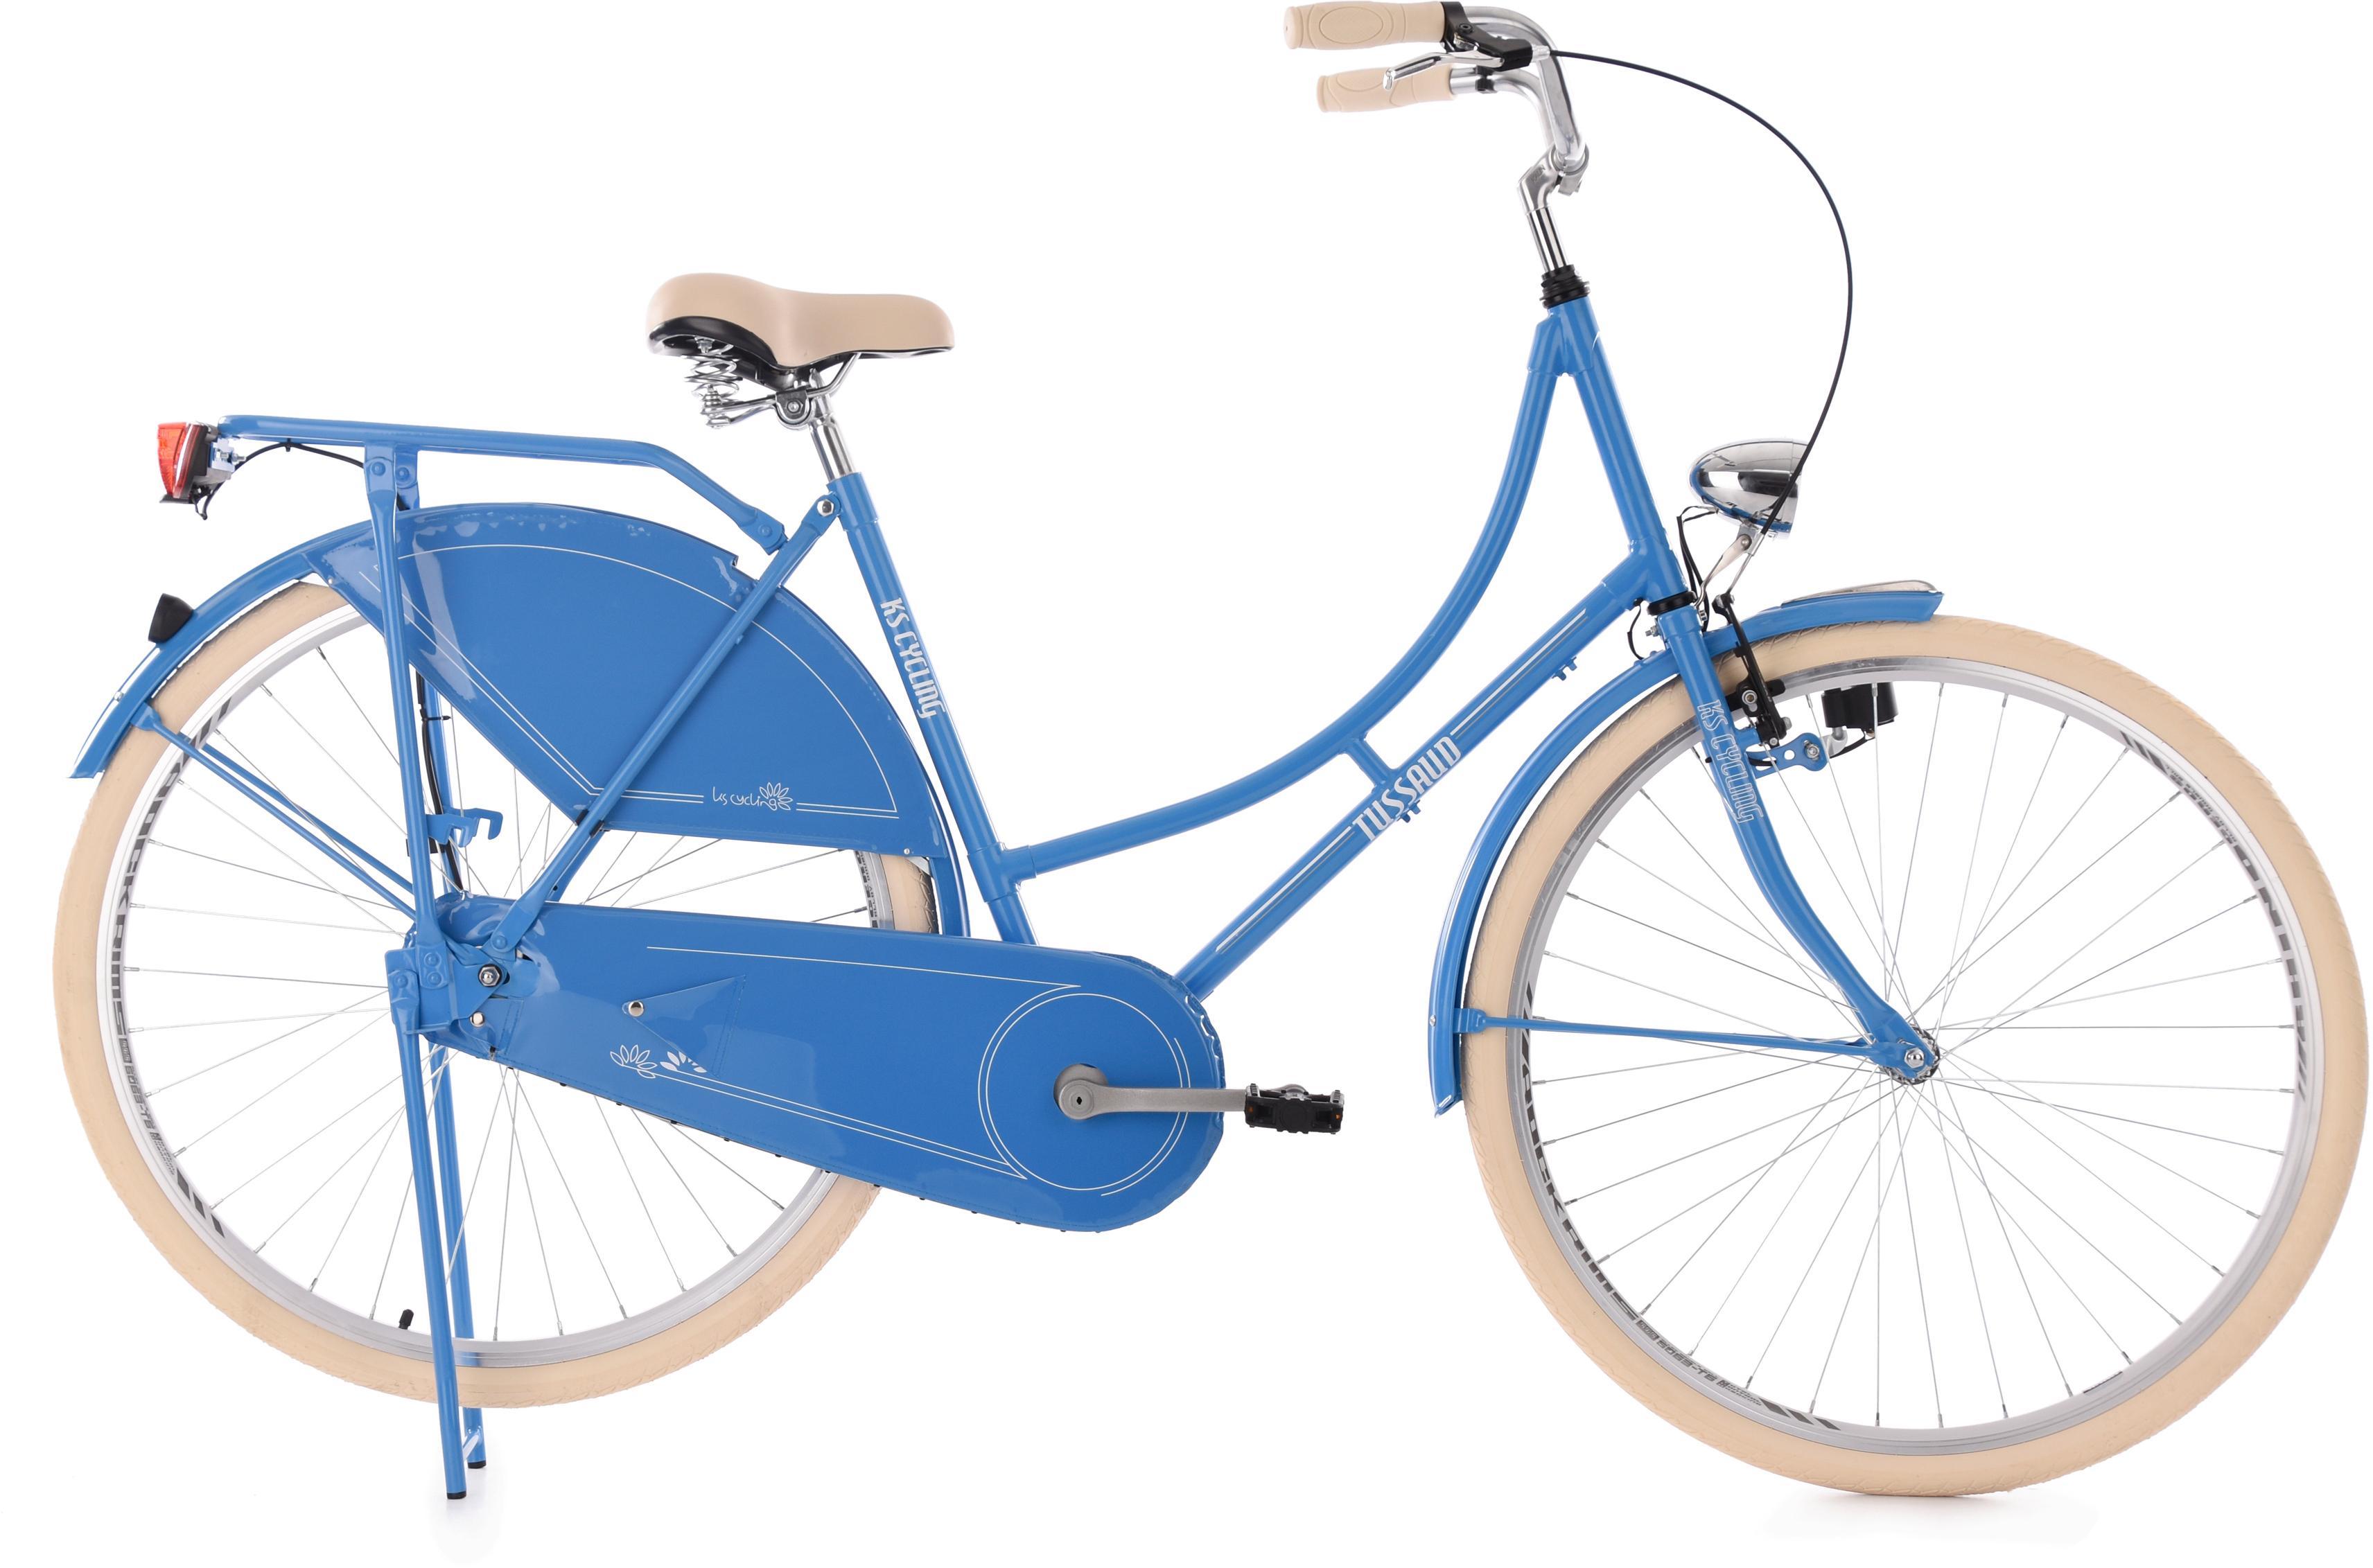 KS Cycling Hollandrad 1 Gang Technik & Freizeit/Sport & Freizeit/Fahrräder & Zubehör/Hollandräder